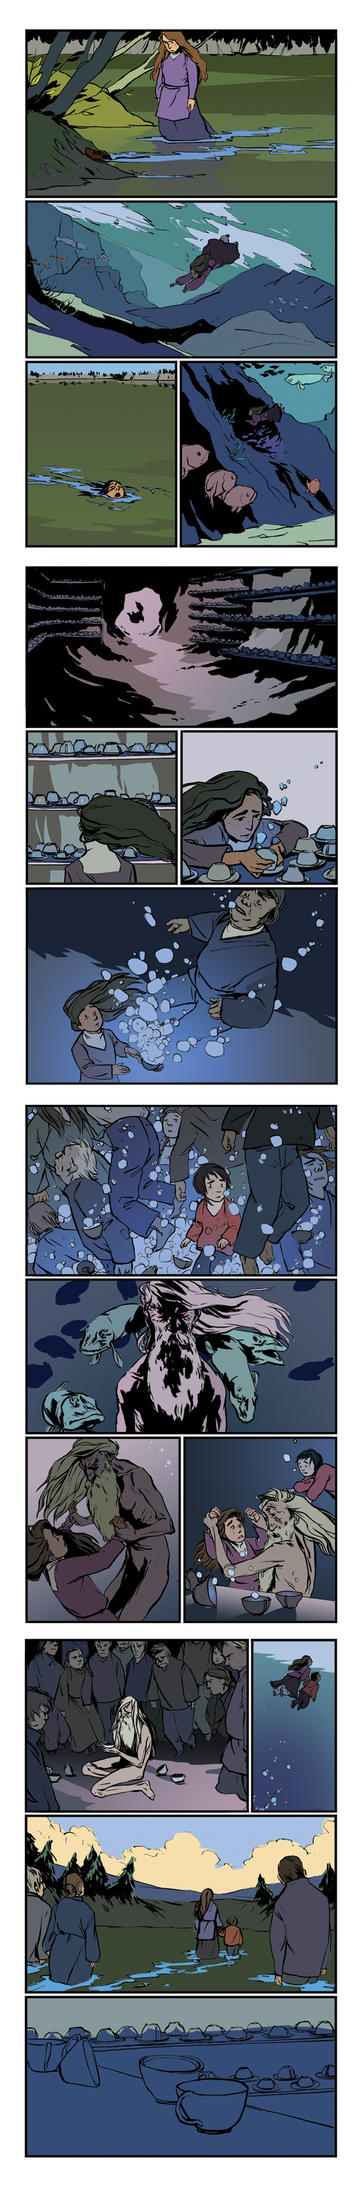 Vodyanoi comic by toerning